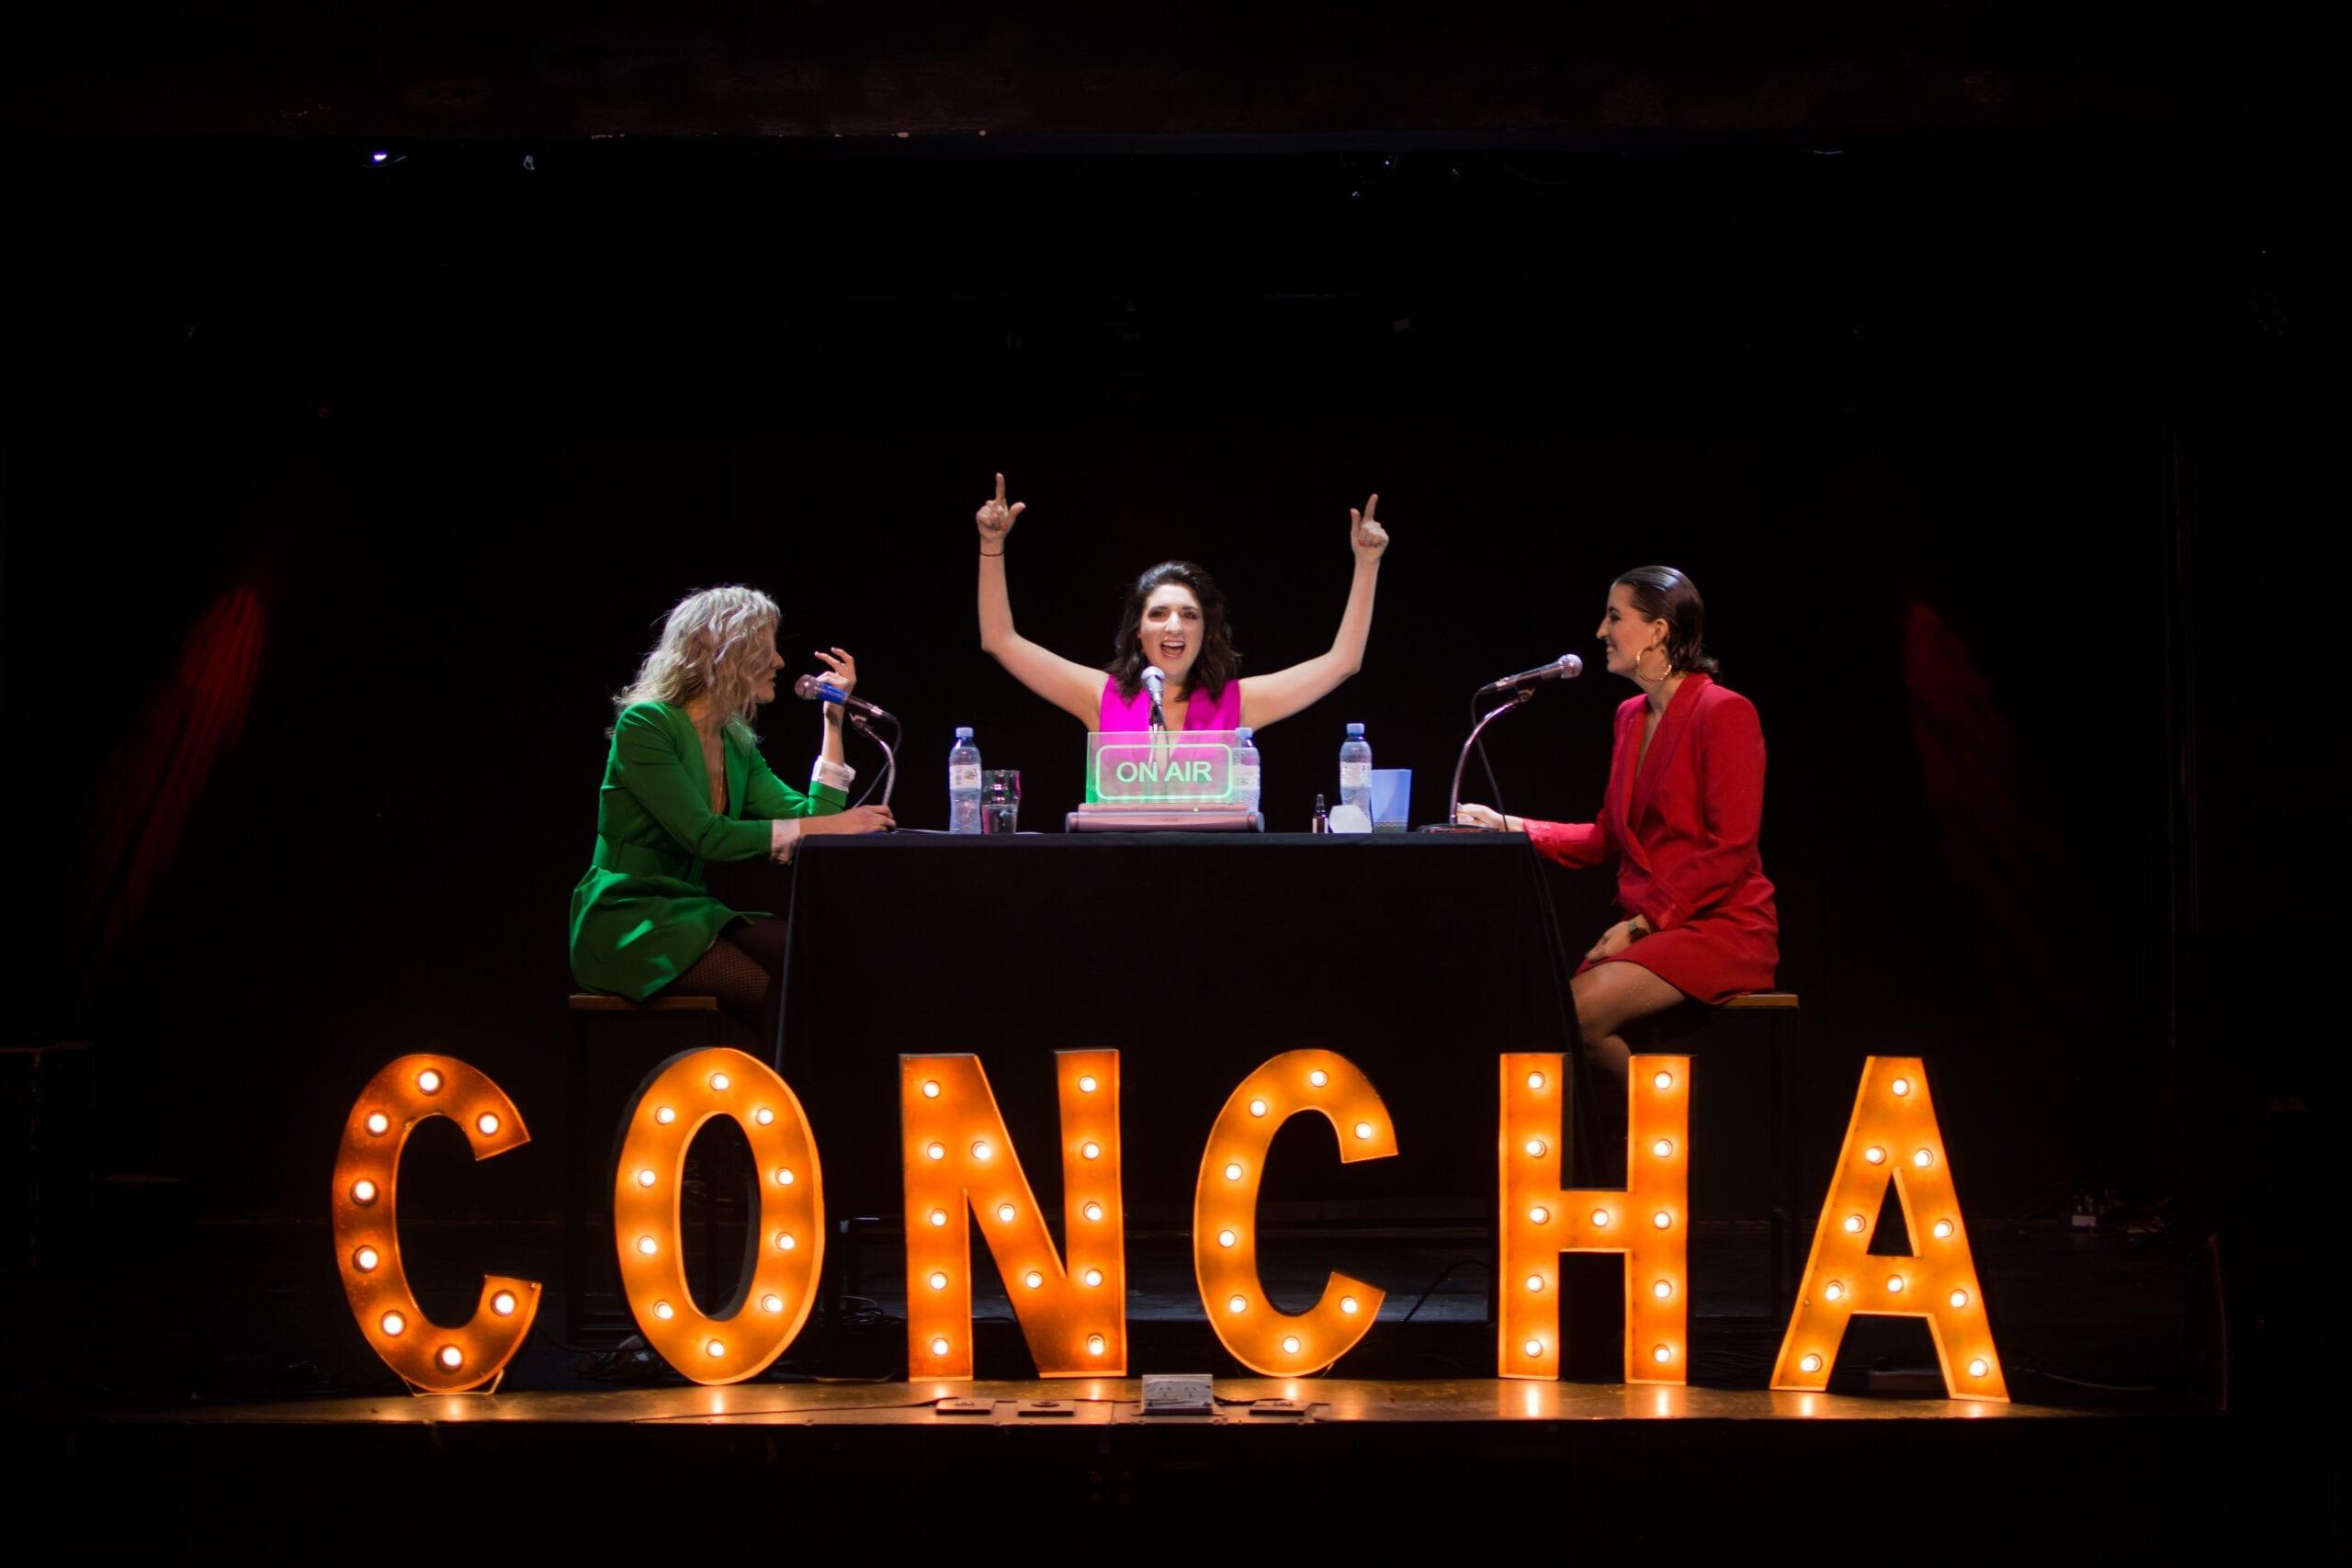 concha podcast conchapodcast